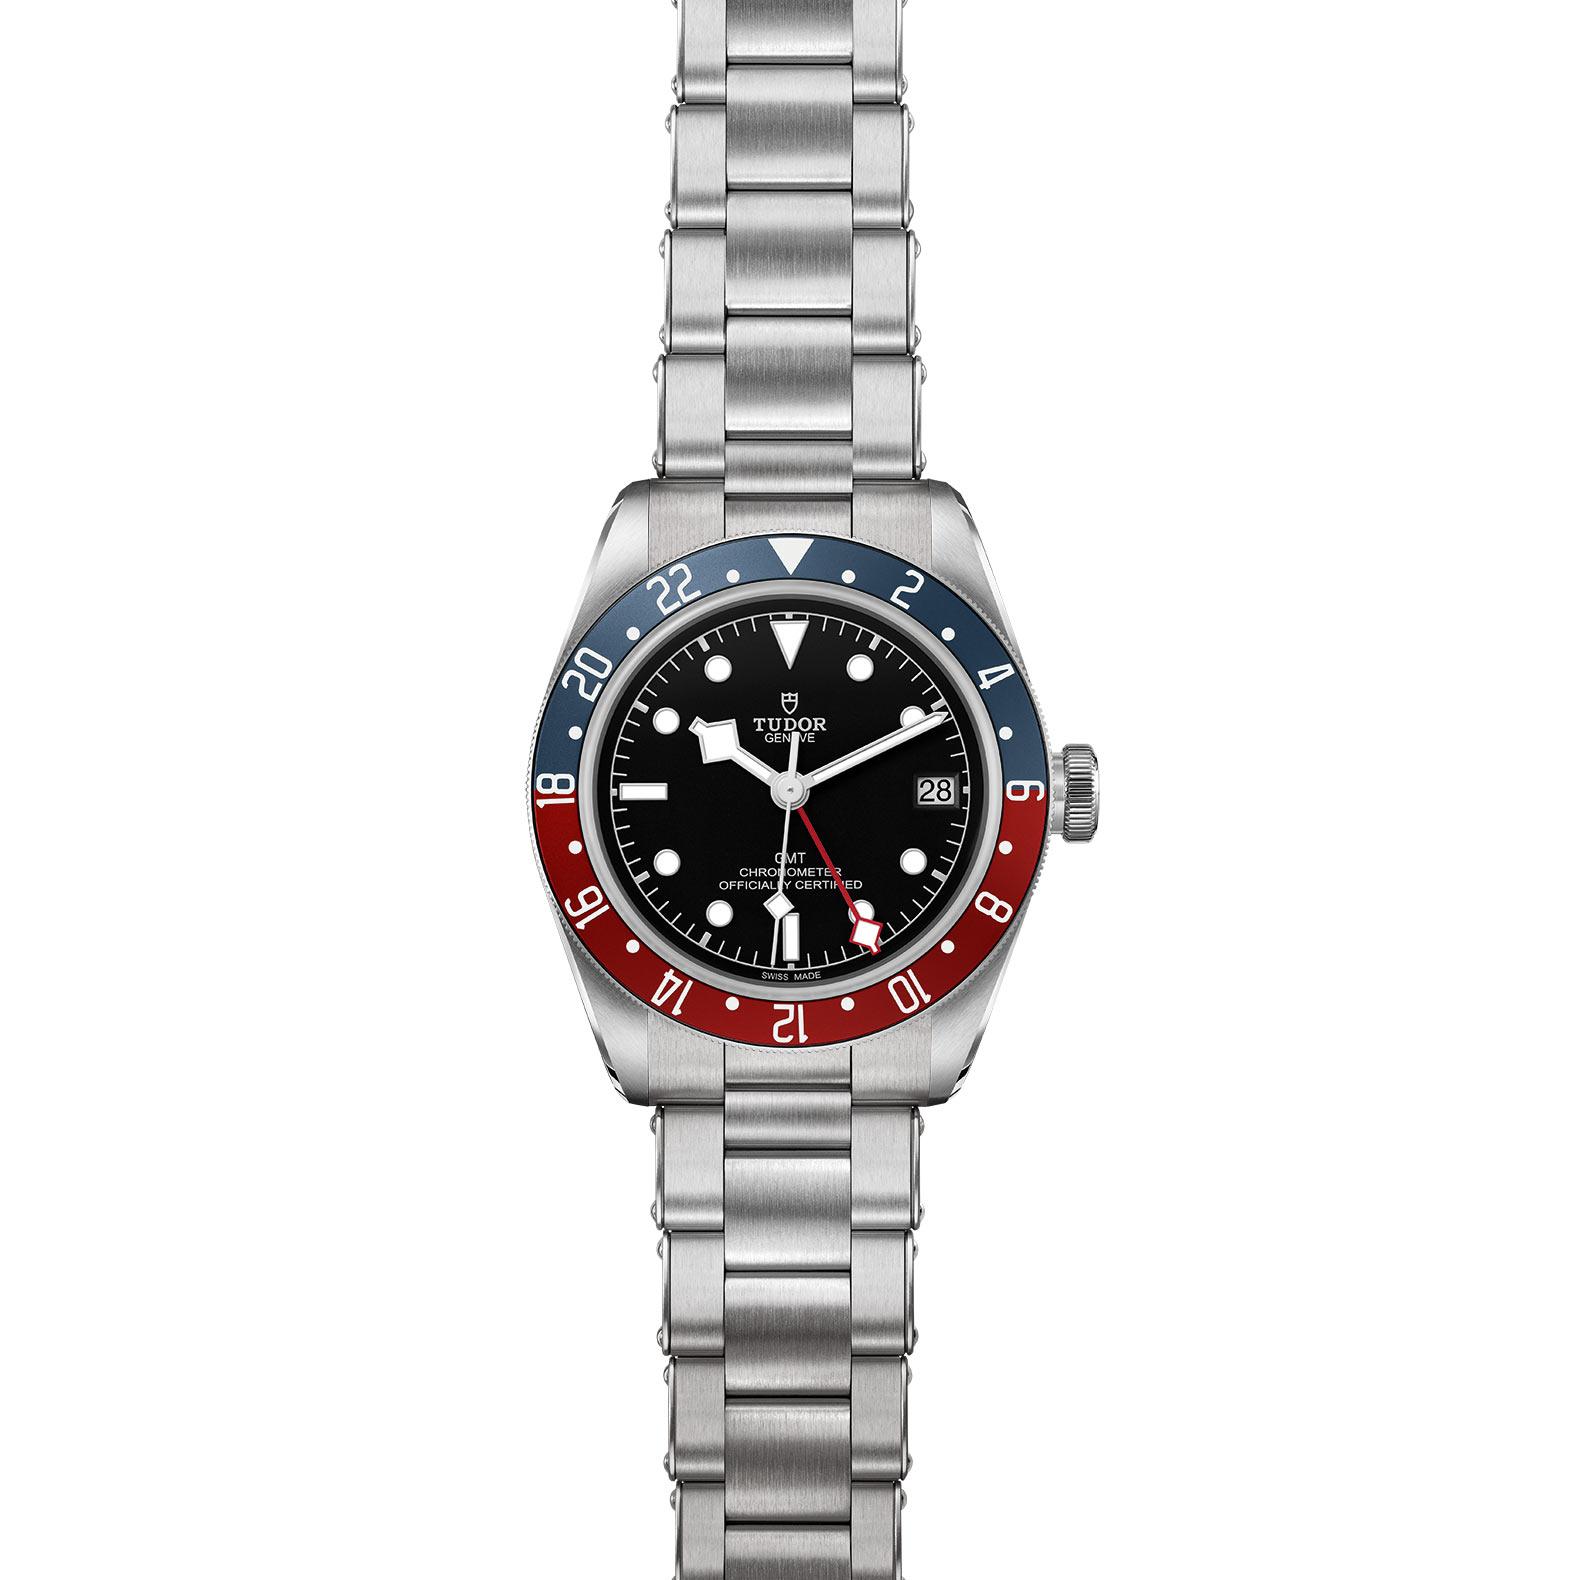 TUDOR Black Bay GMT M79830RB 0001 Frontfacing